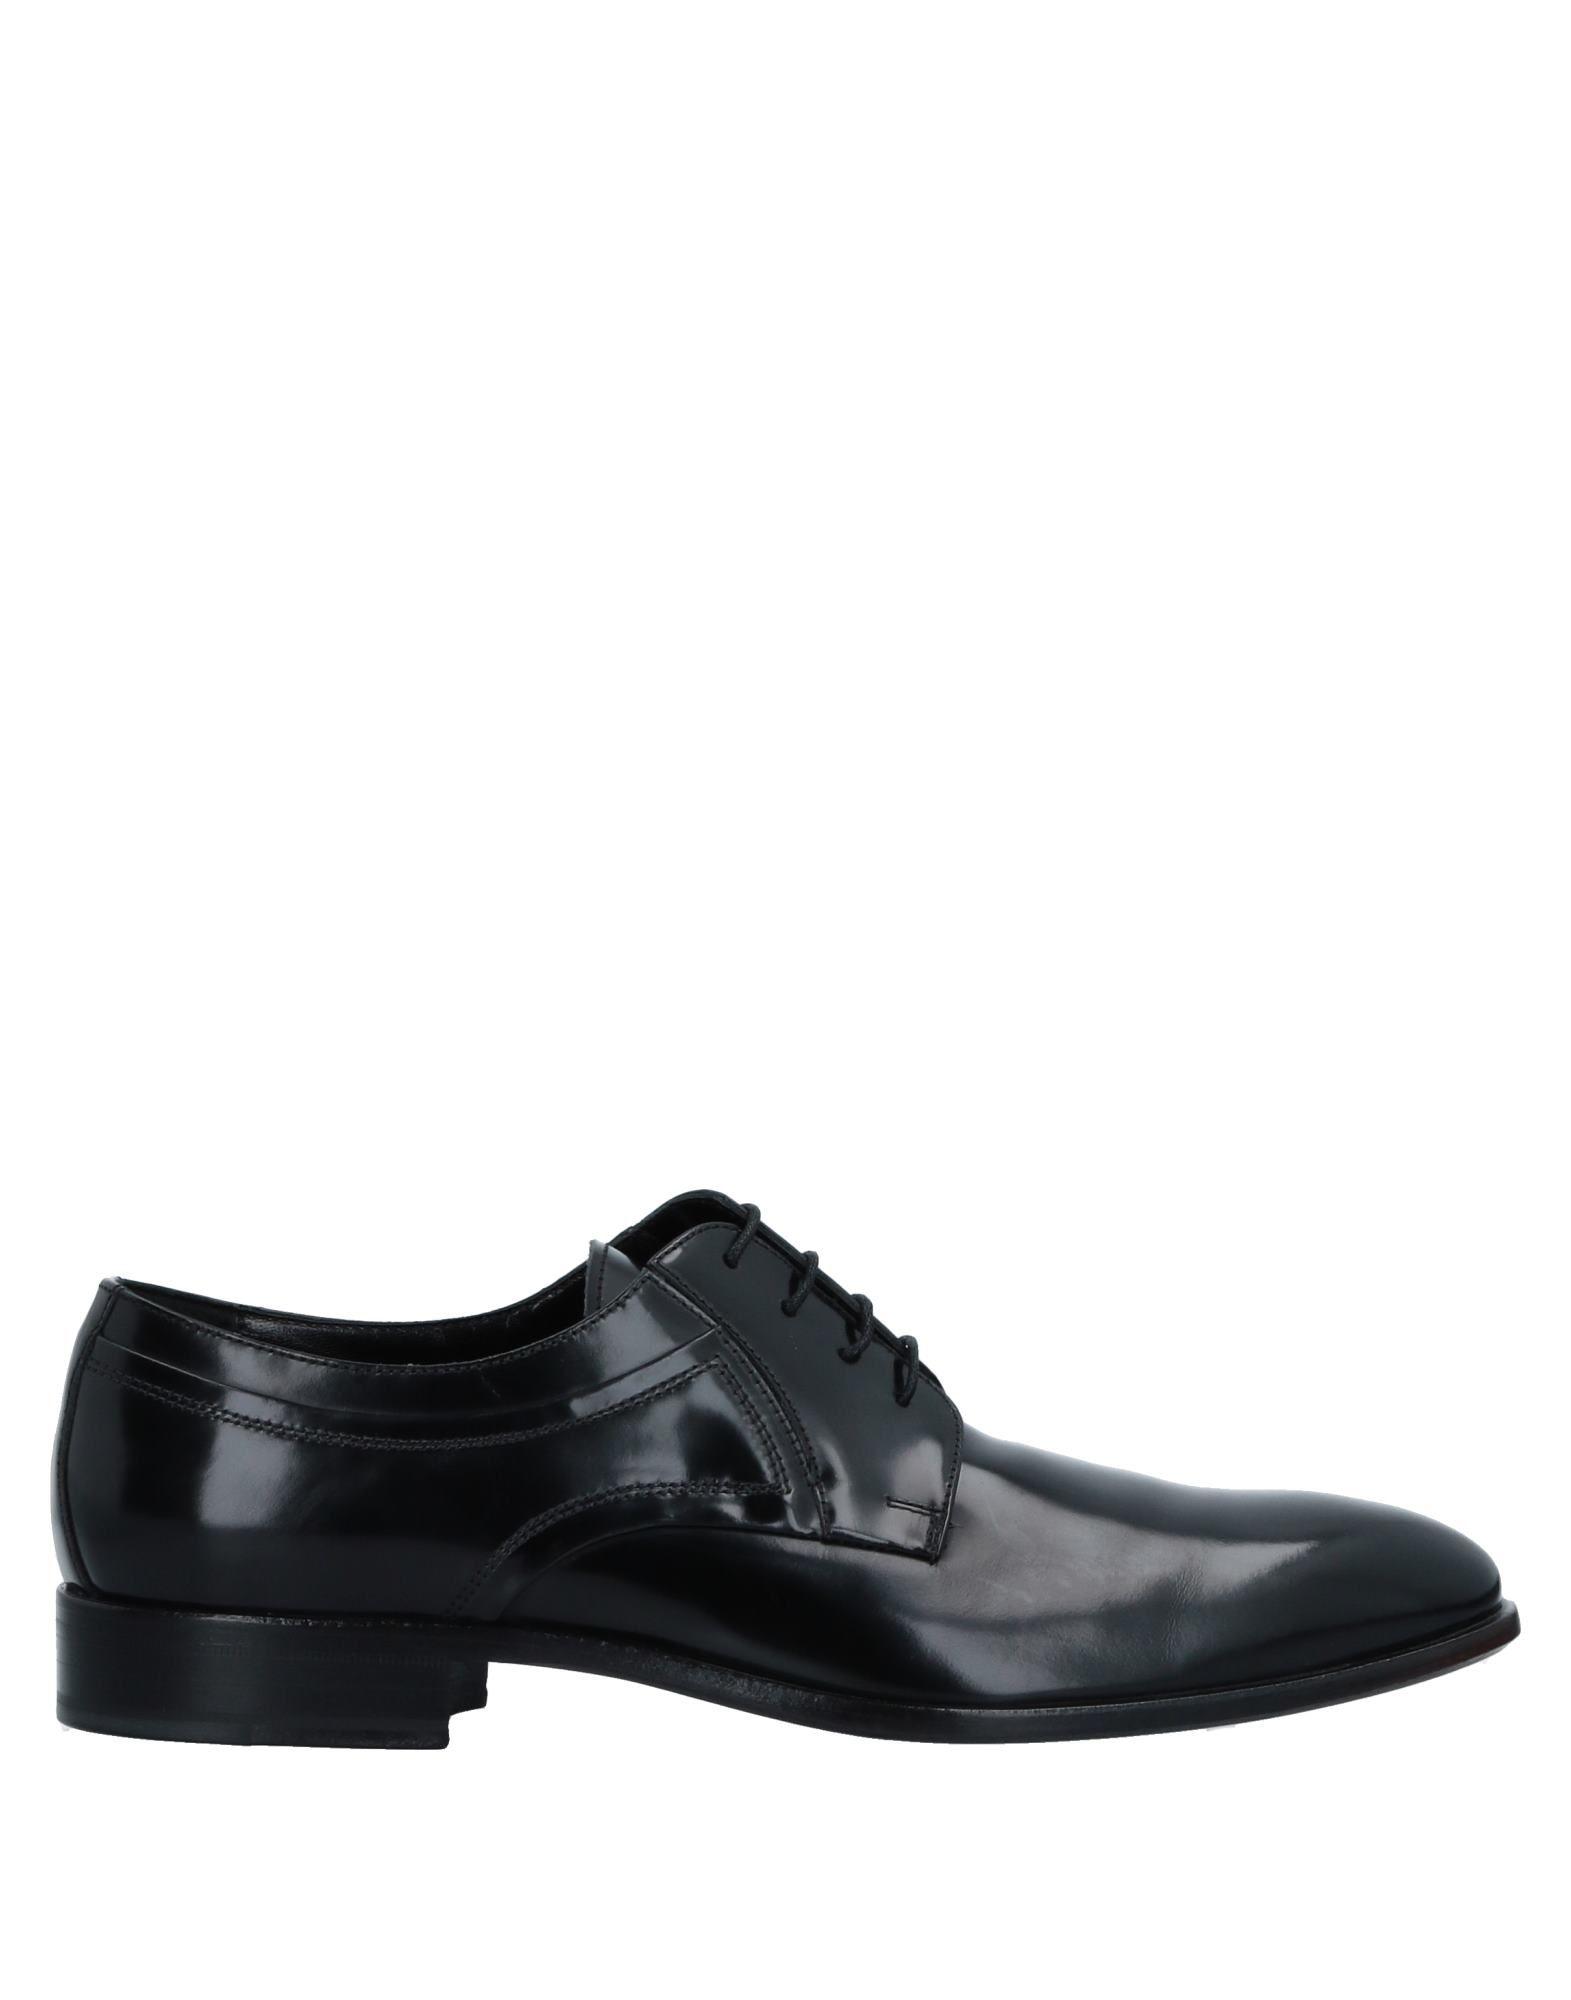 Rabatt echte Schuhe Pietro Pizzuti Schnürschuhe Herren  11520140DG